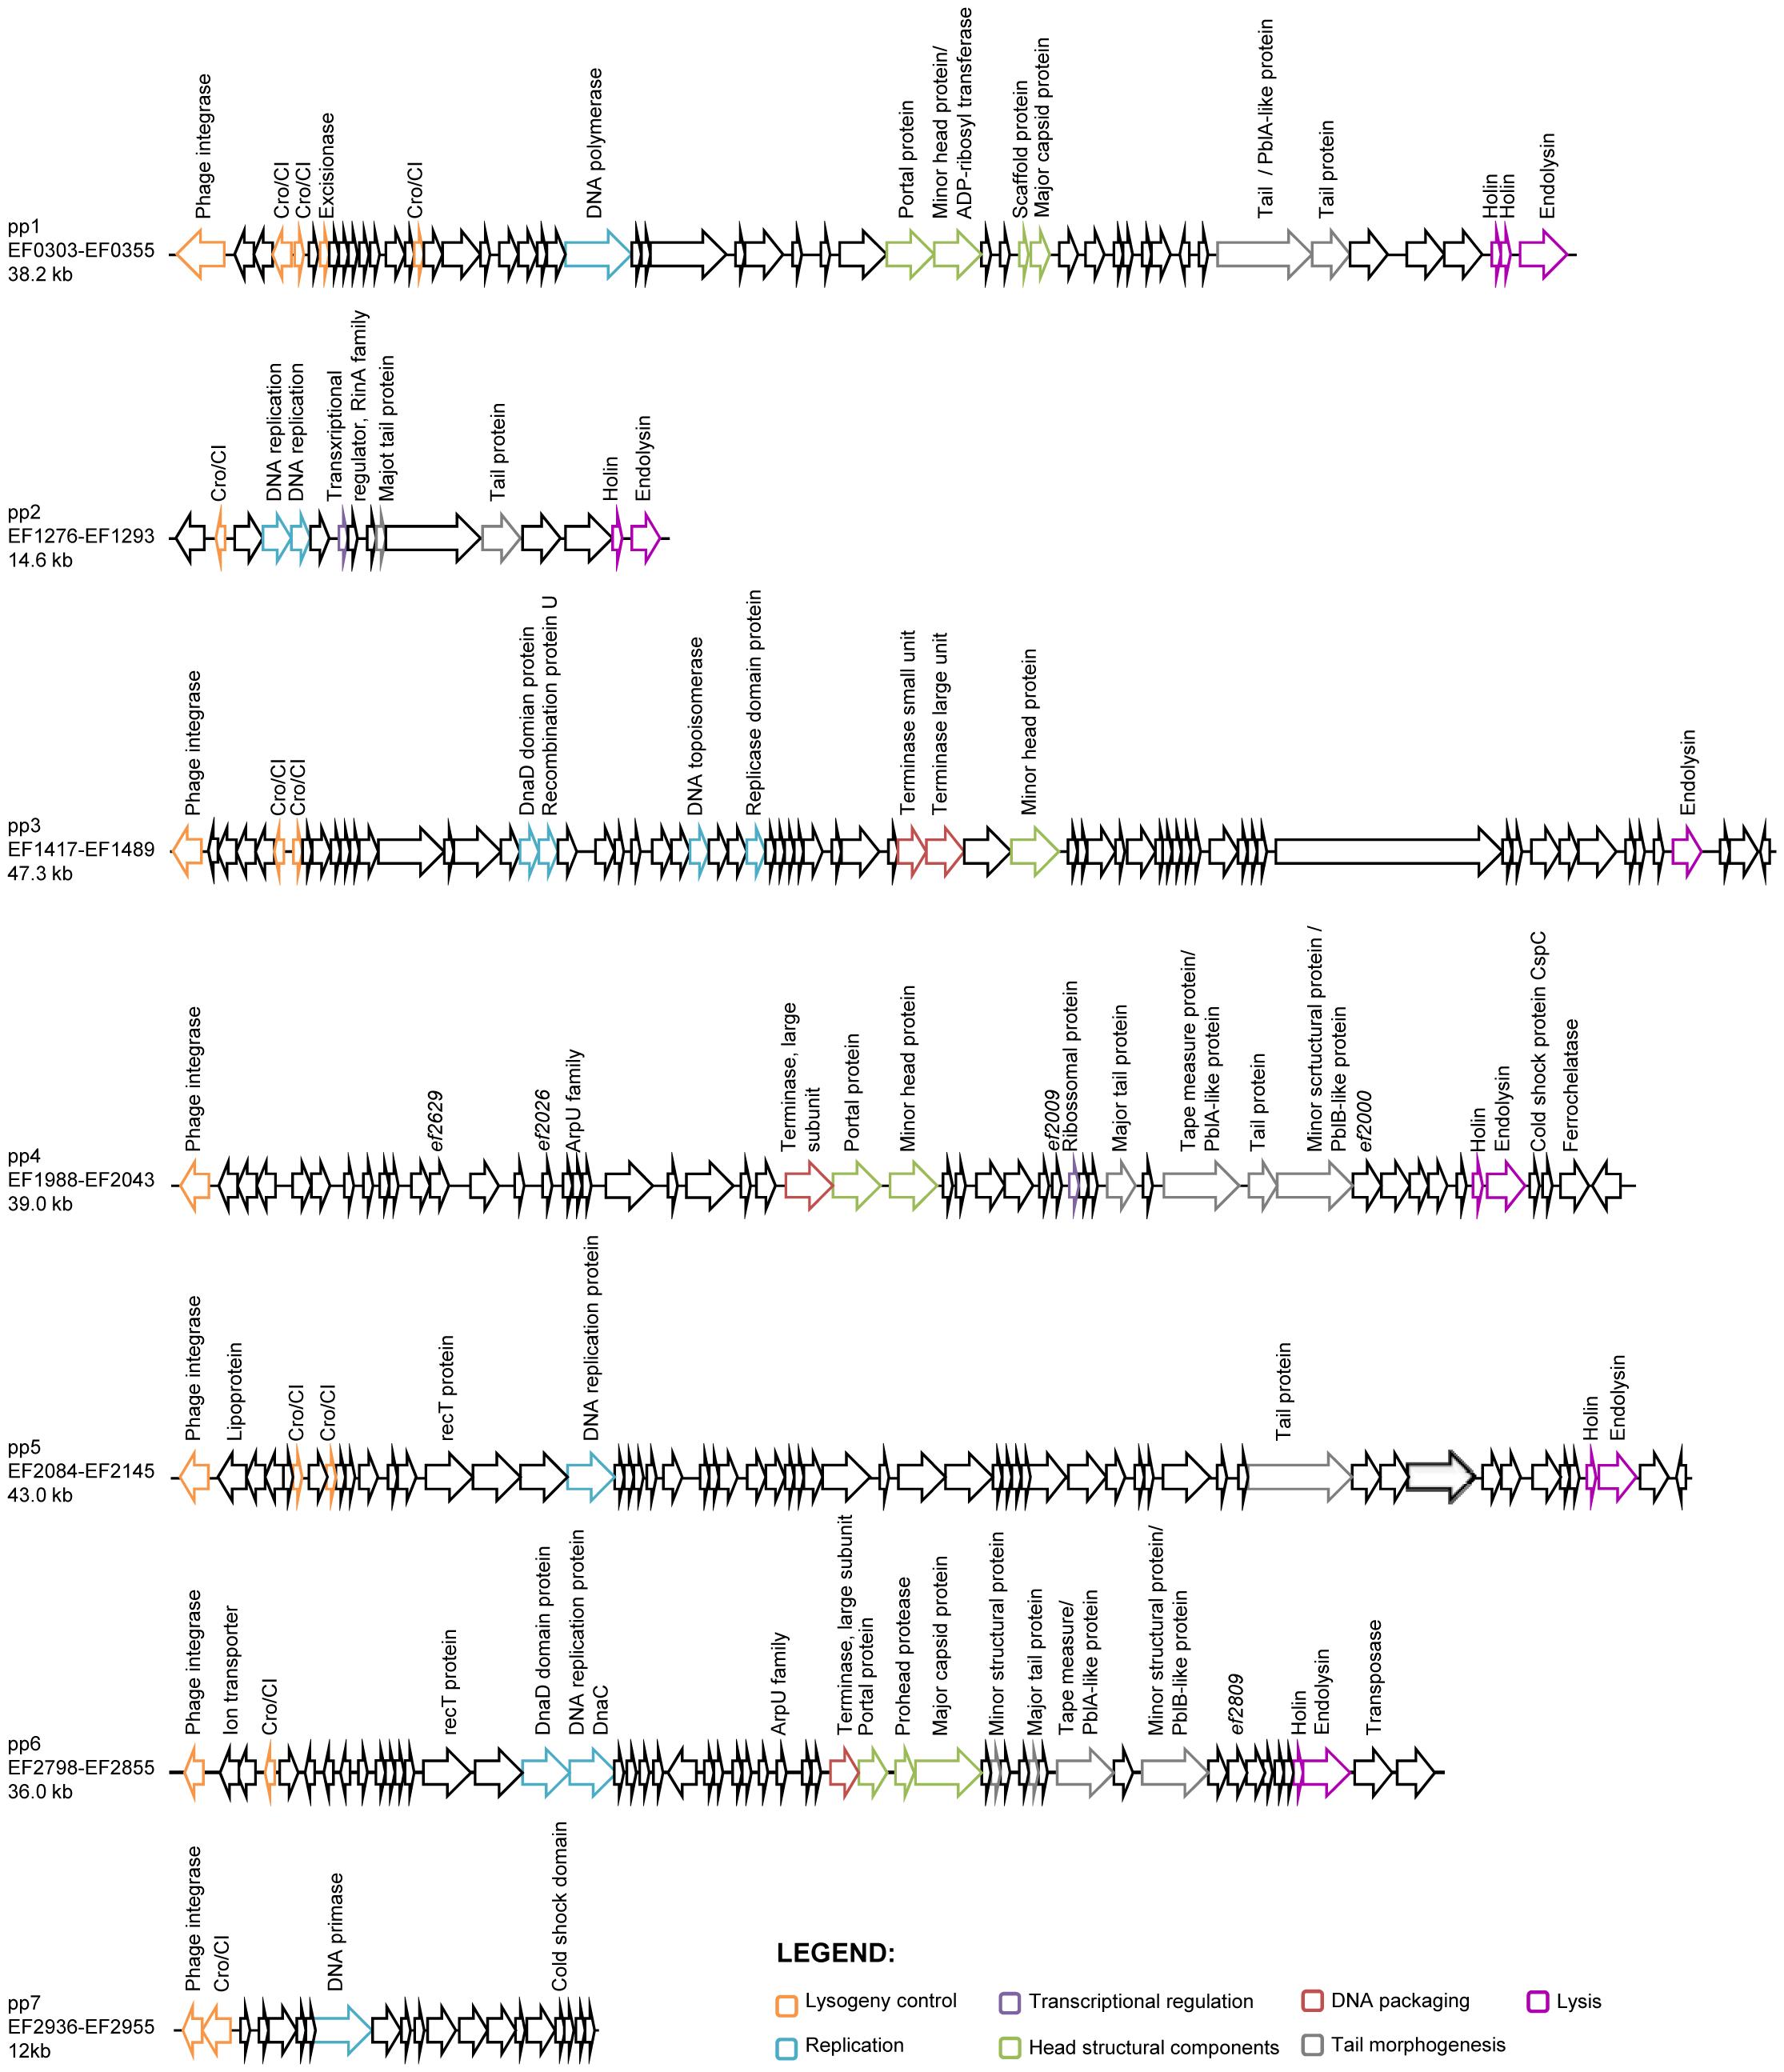 Genomic organization of <i>E. faecalis</i> V583 prophages.